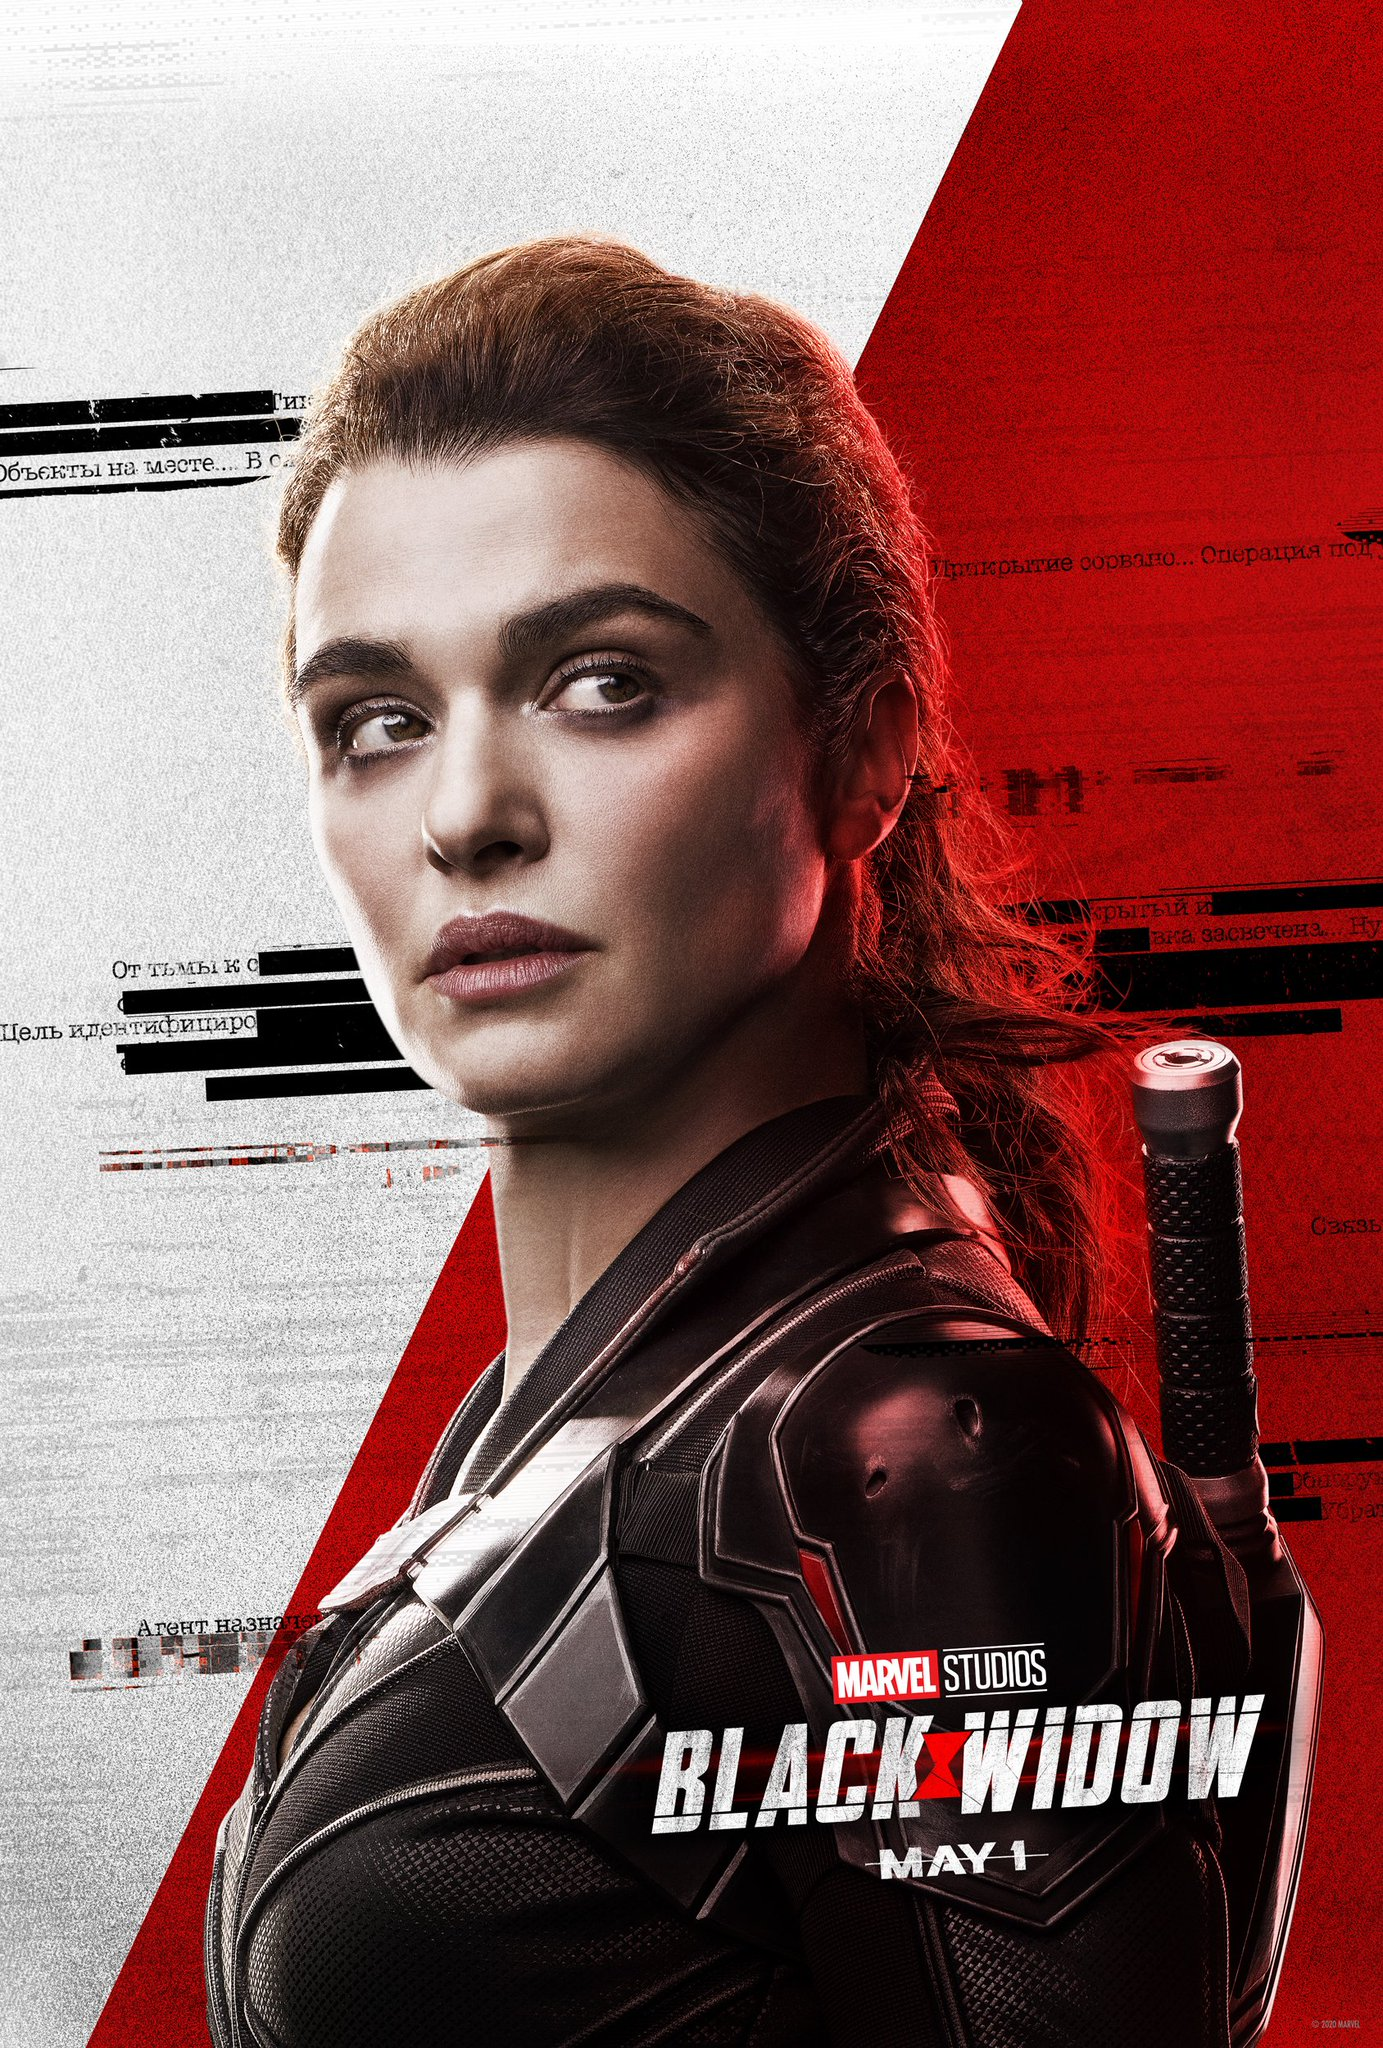 Black Widow (film) poster 006.jpg